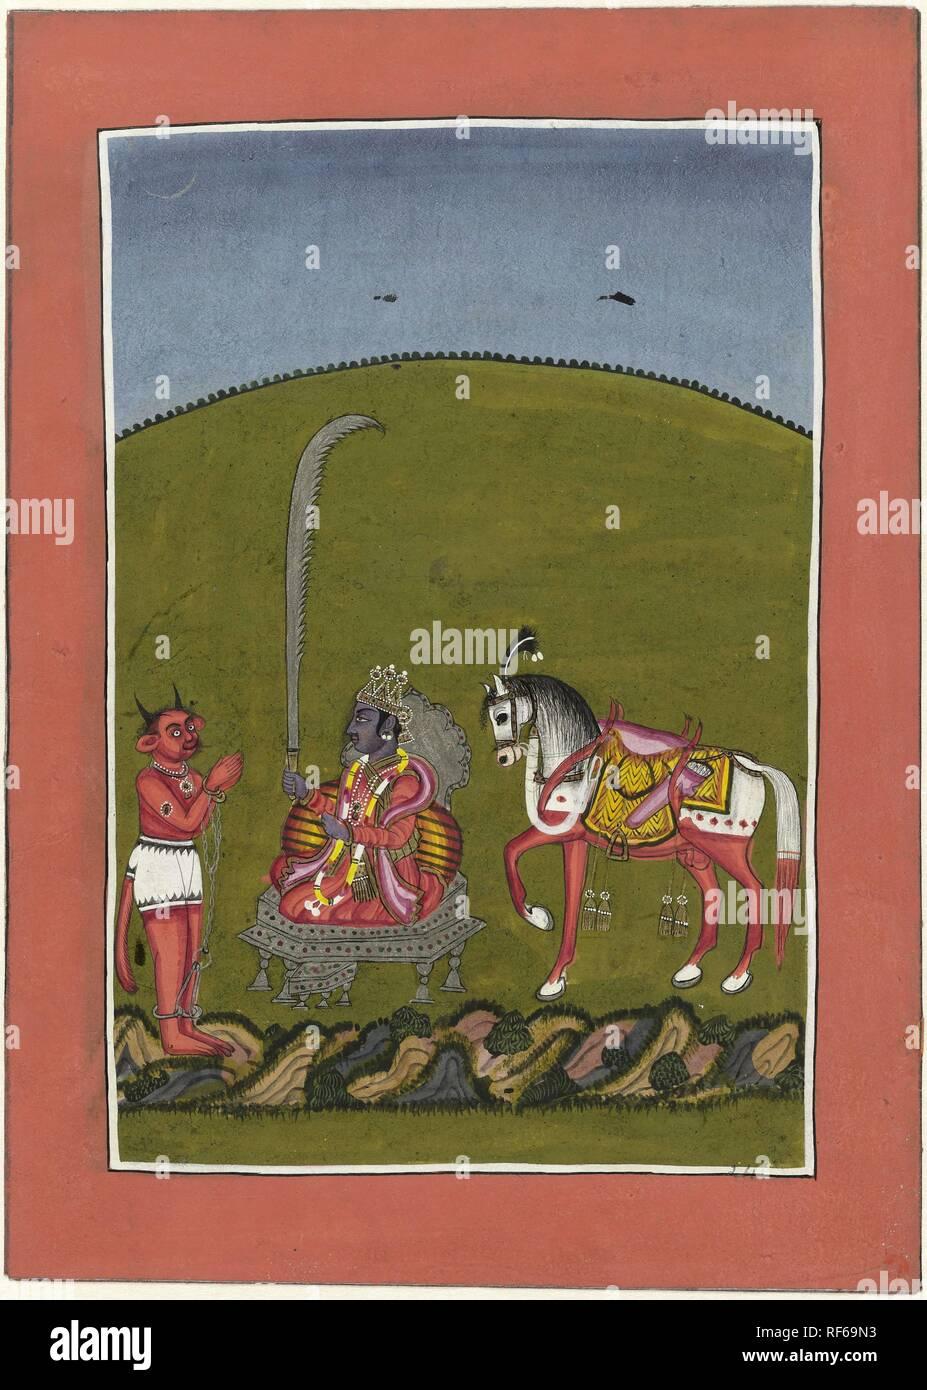 Vishnu Avatars High Resolution Stock Photography and Images   Alamy